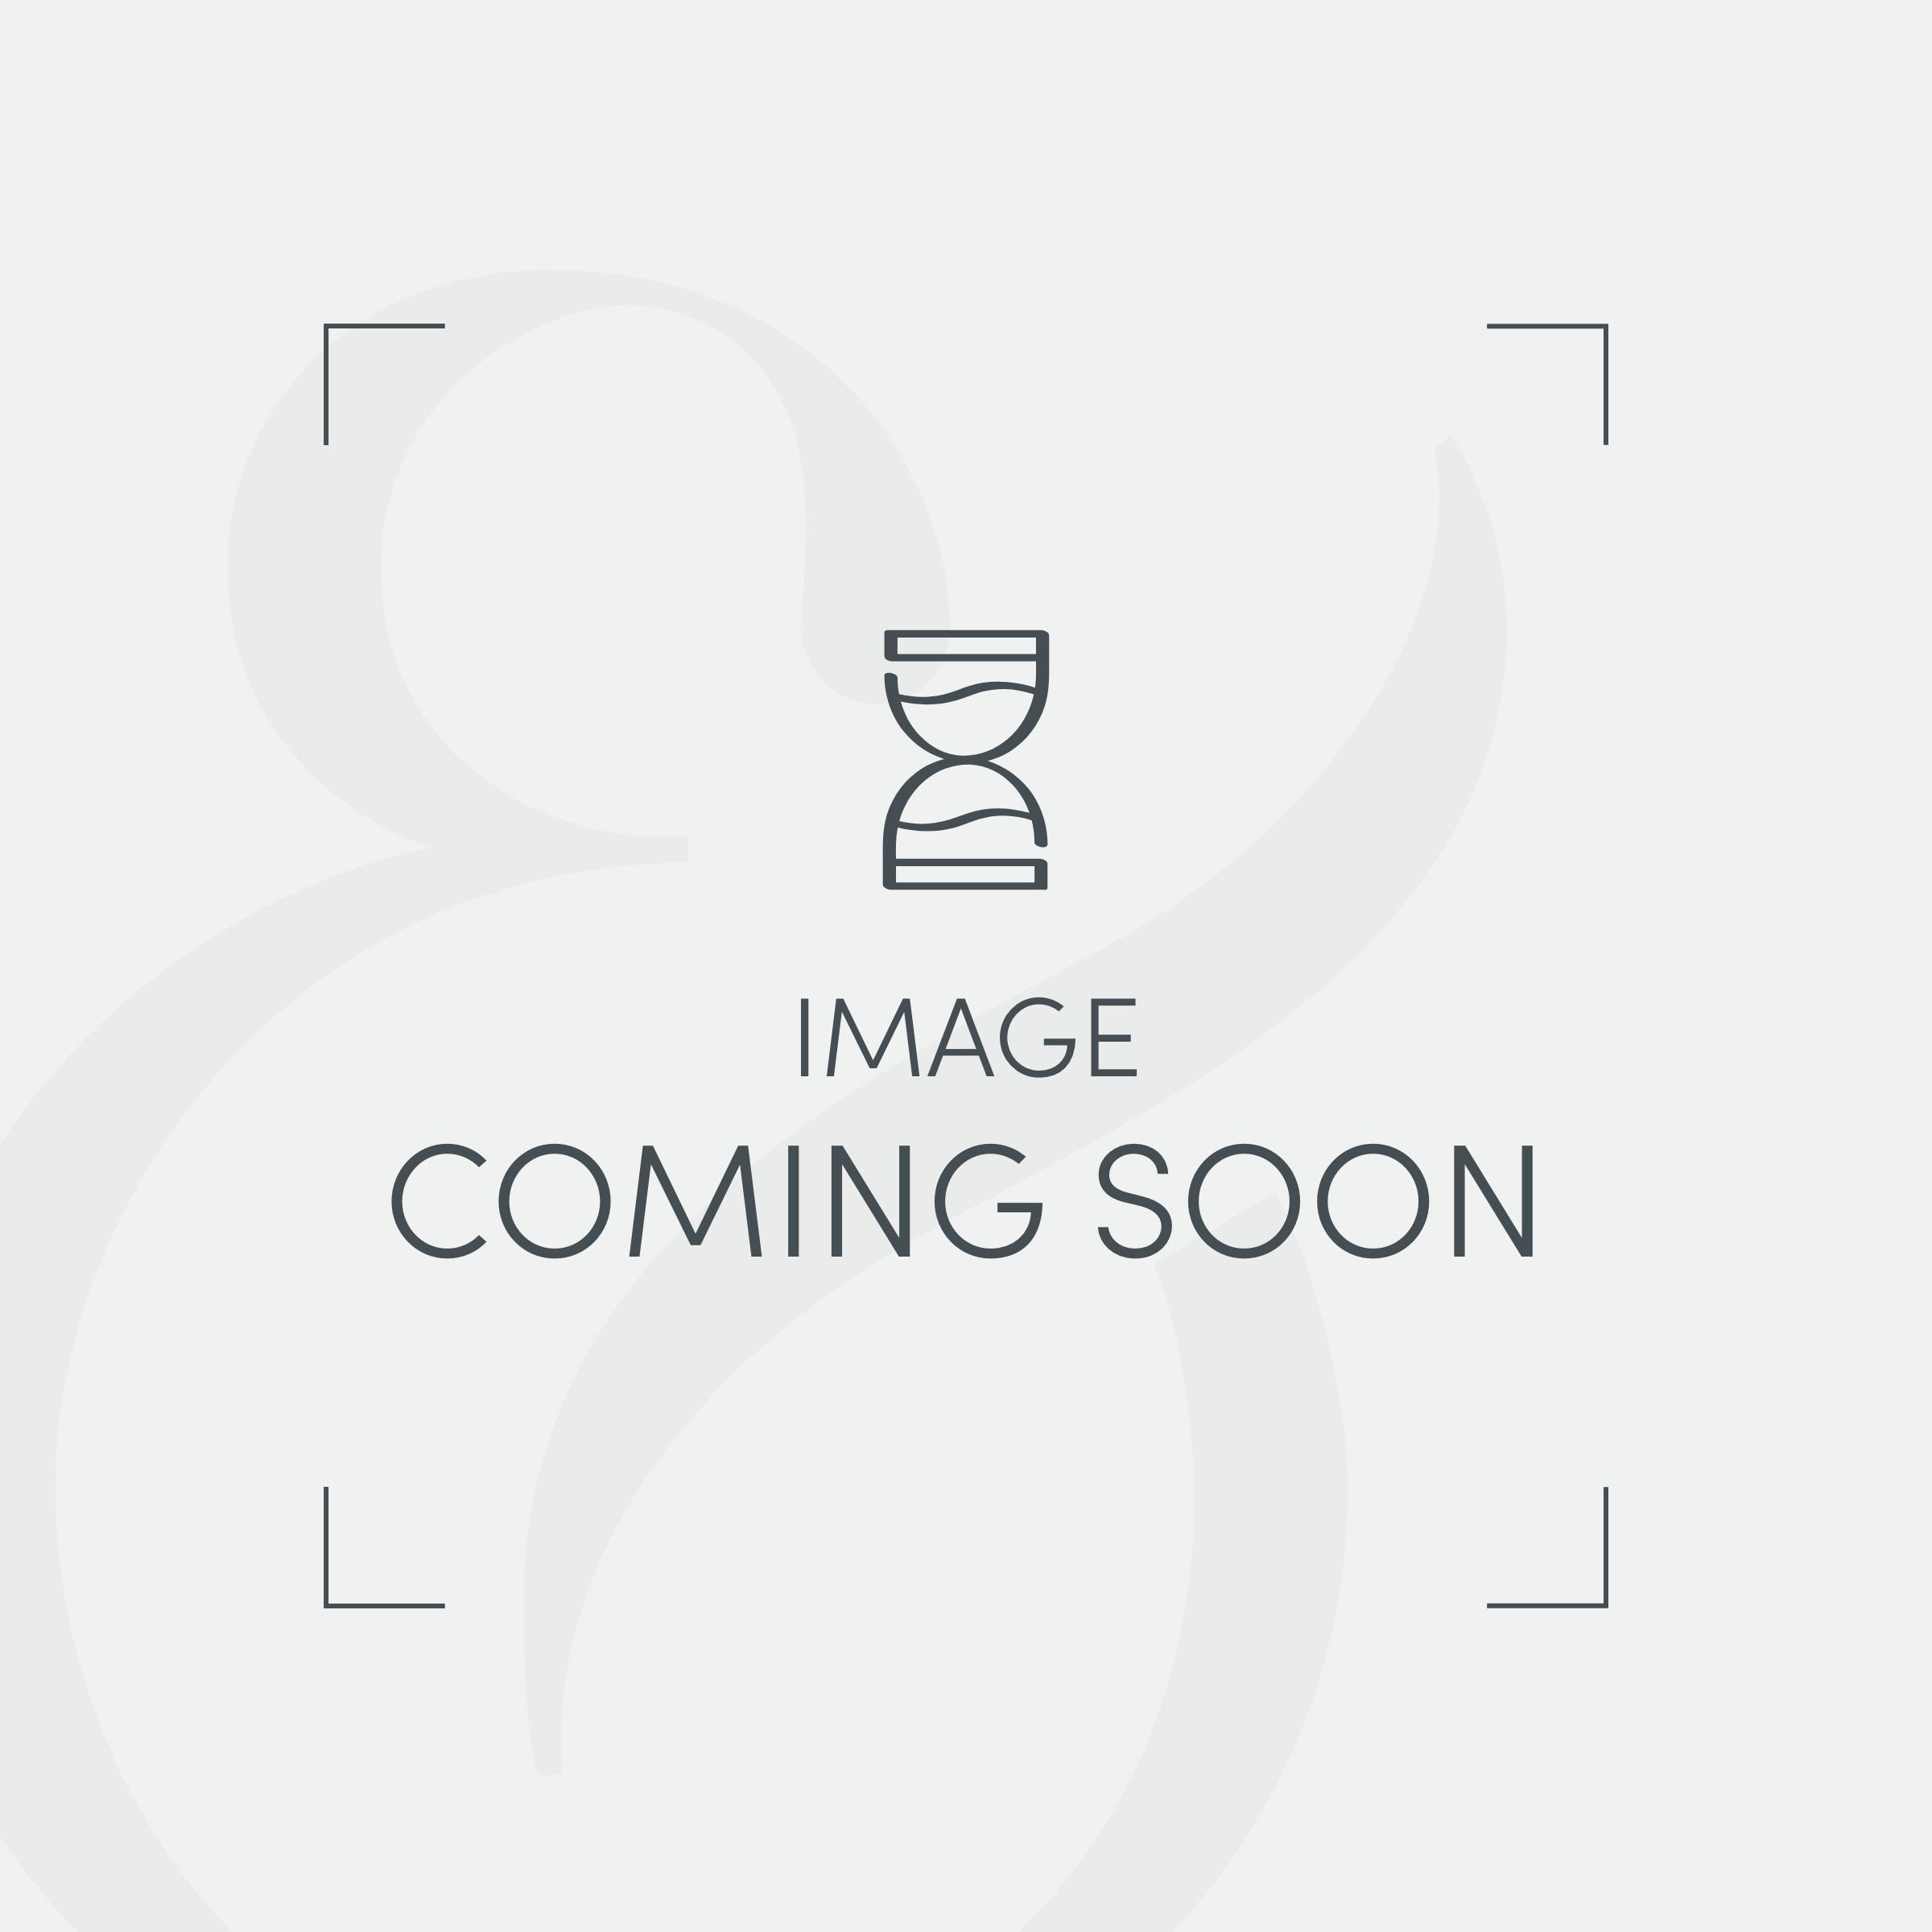 Dusky Blue Luxury Egyptian Cotton Bath Sheet Multipack - Set of 4